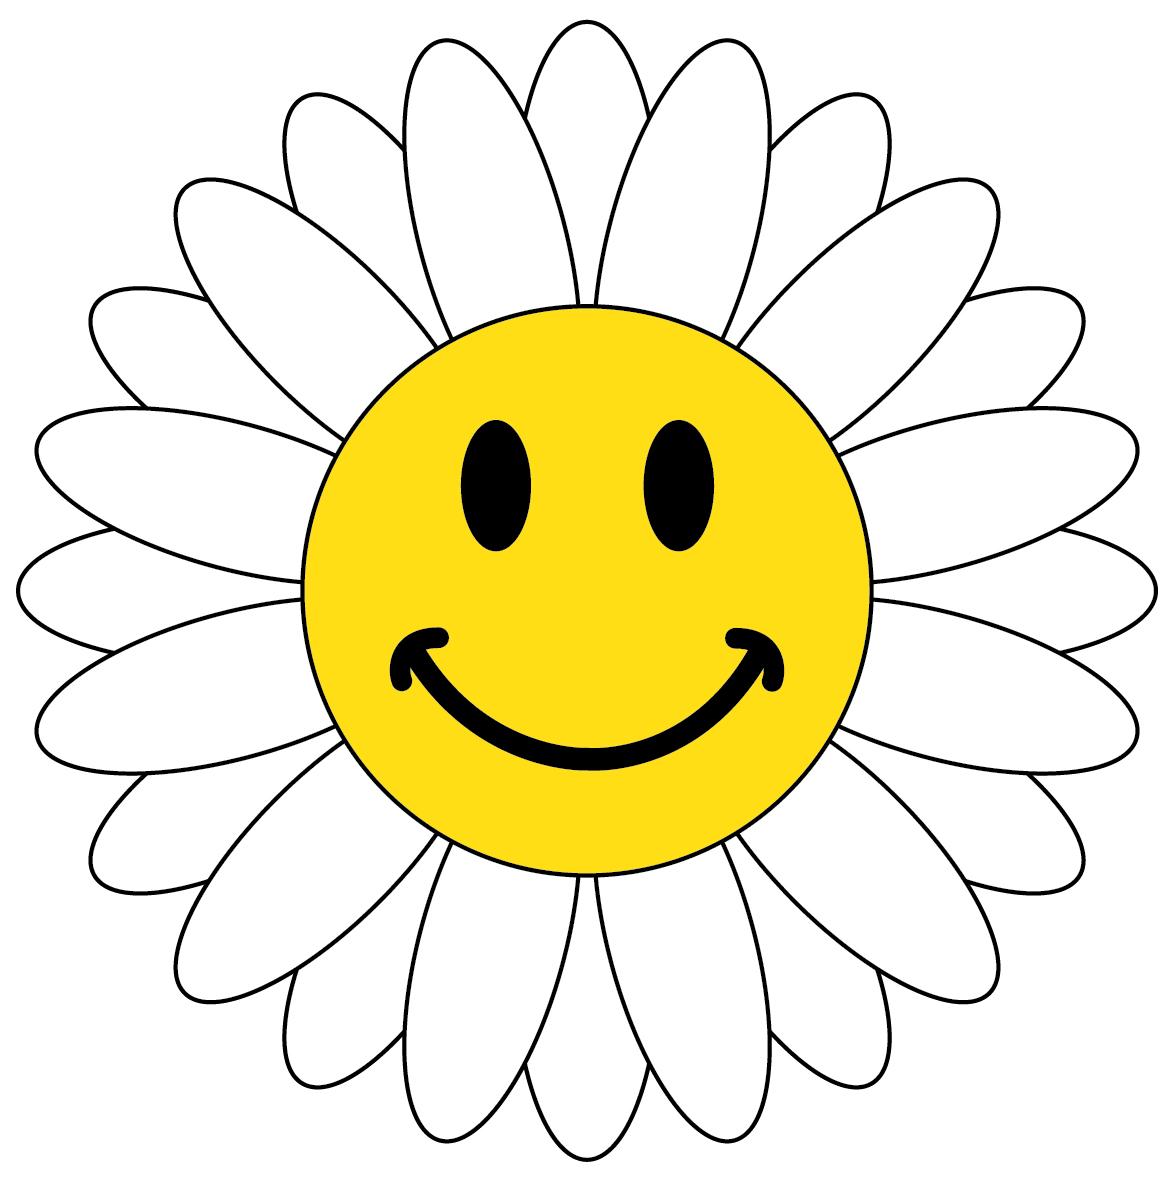 Flower smiley face clipart. Best clipartion com free